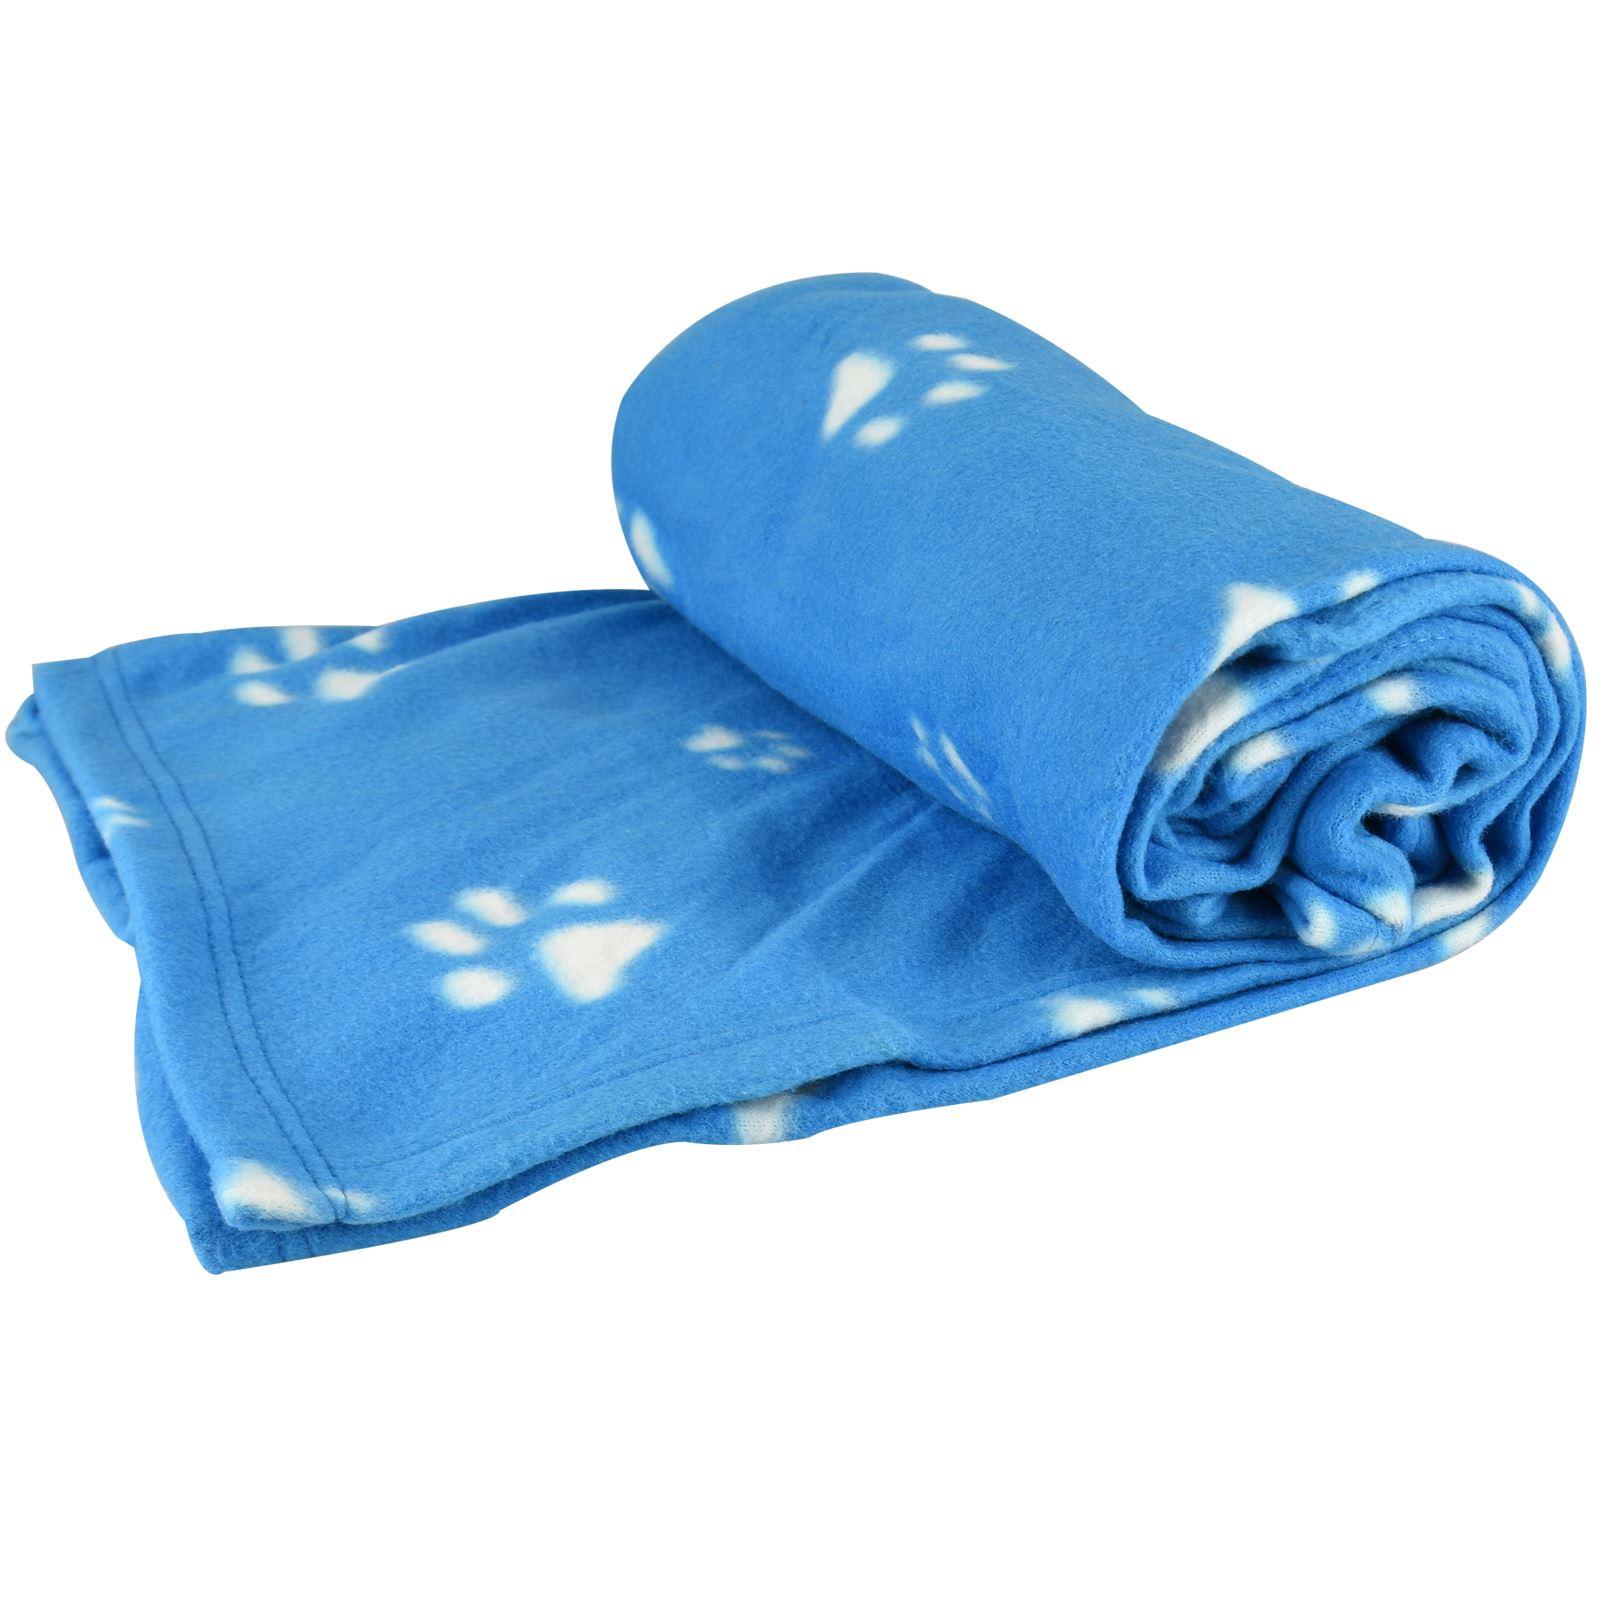 Warm-Pet-Mat-Paw-Print-Cat-Dog-Puppy-Fleece-Soft-Blanket-Bed-Cushion-One-Size thumbnail 10